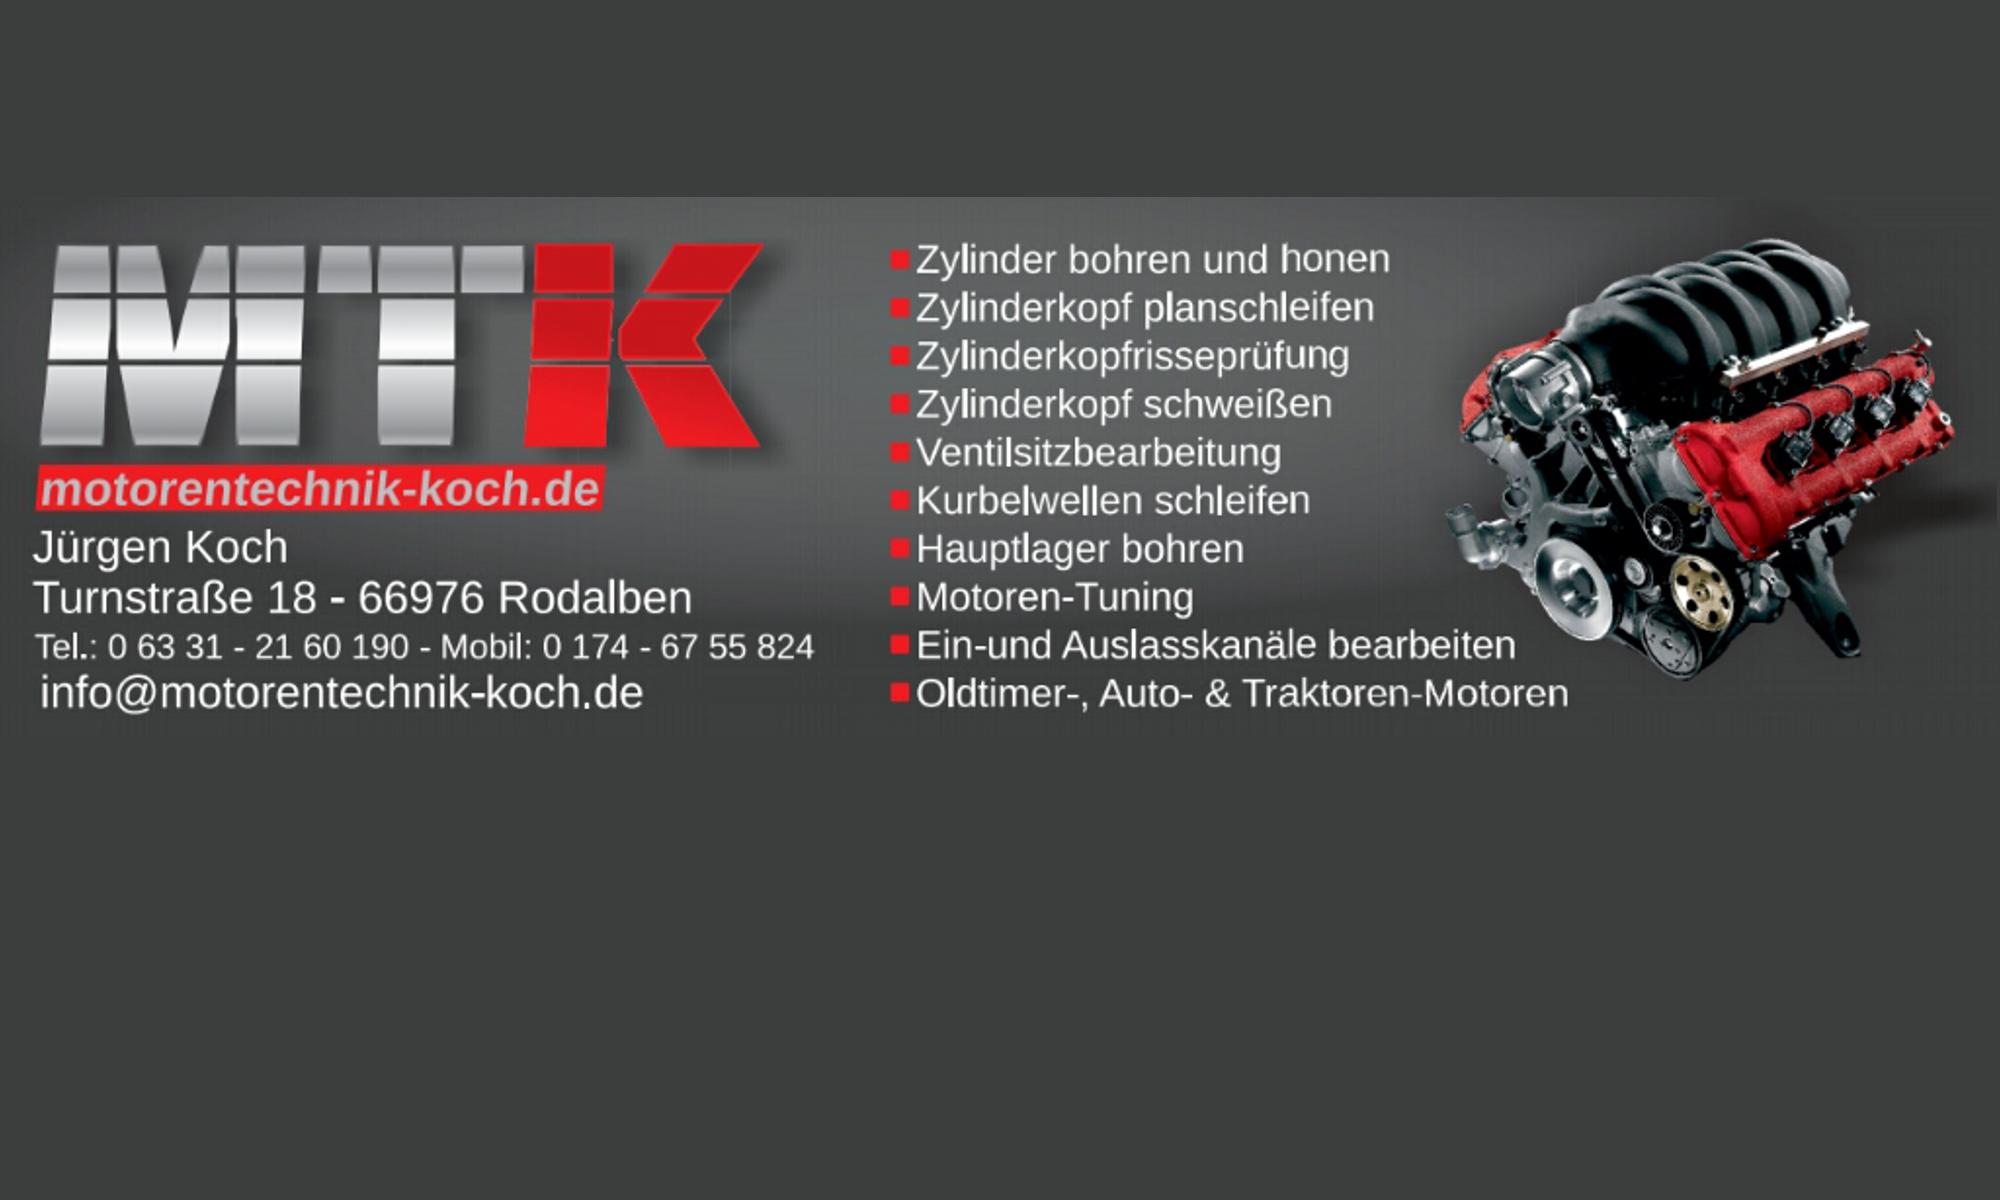 Motorentechnik Koch